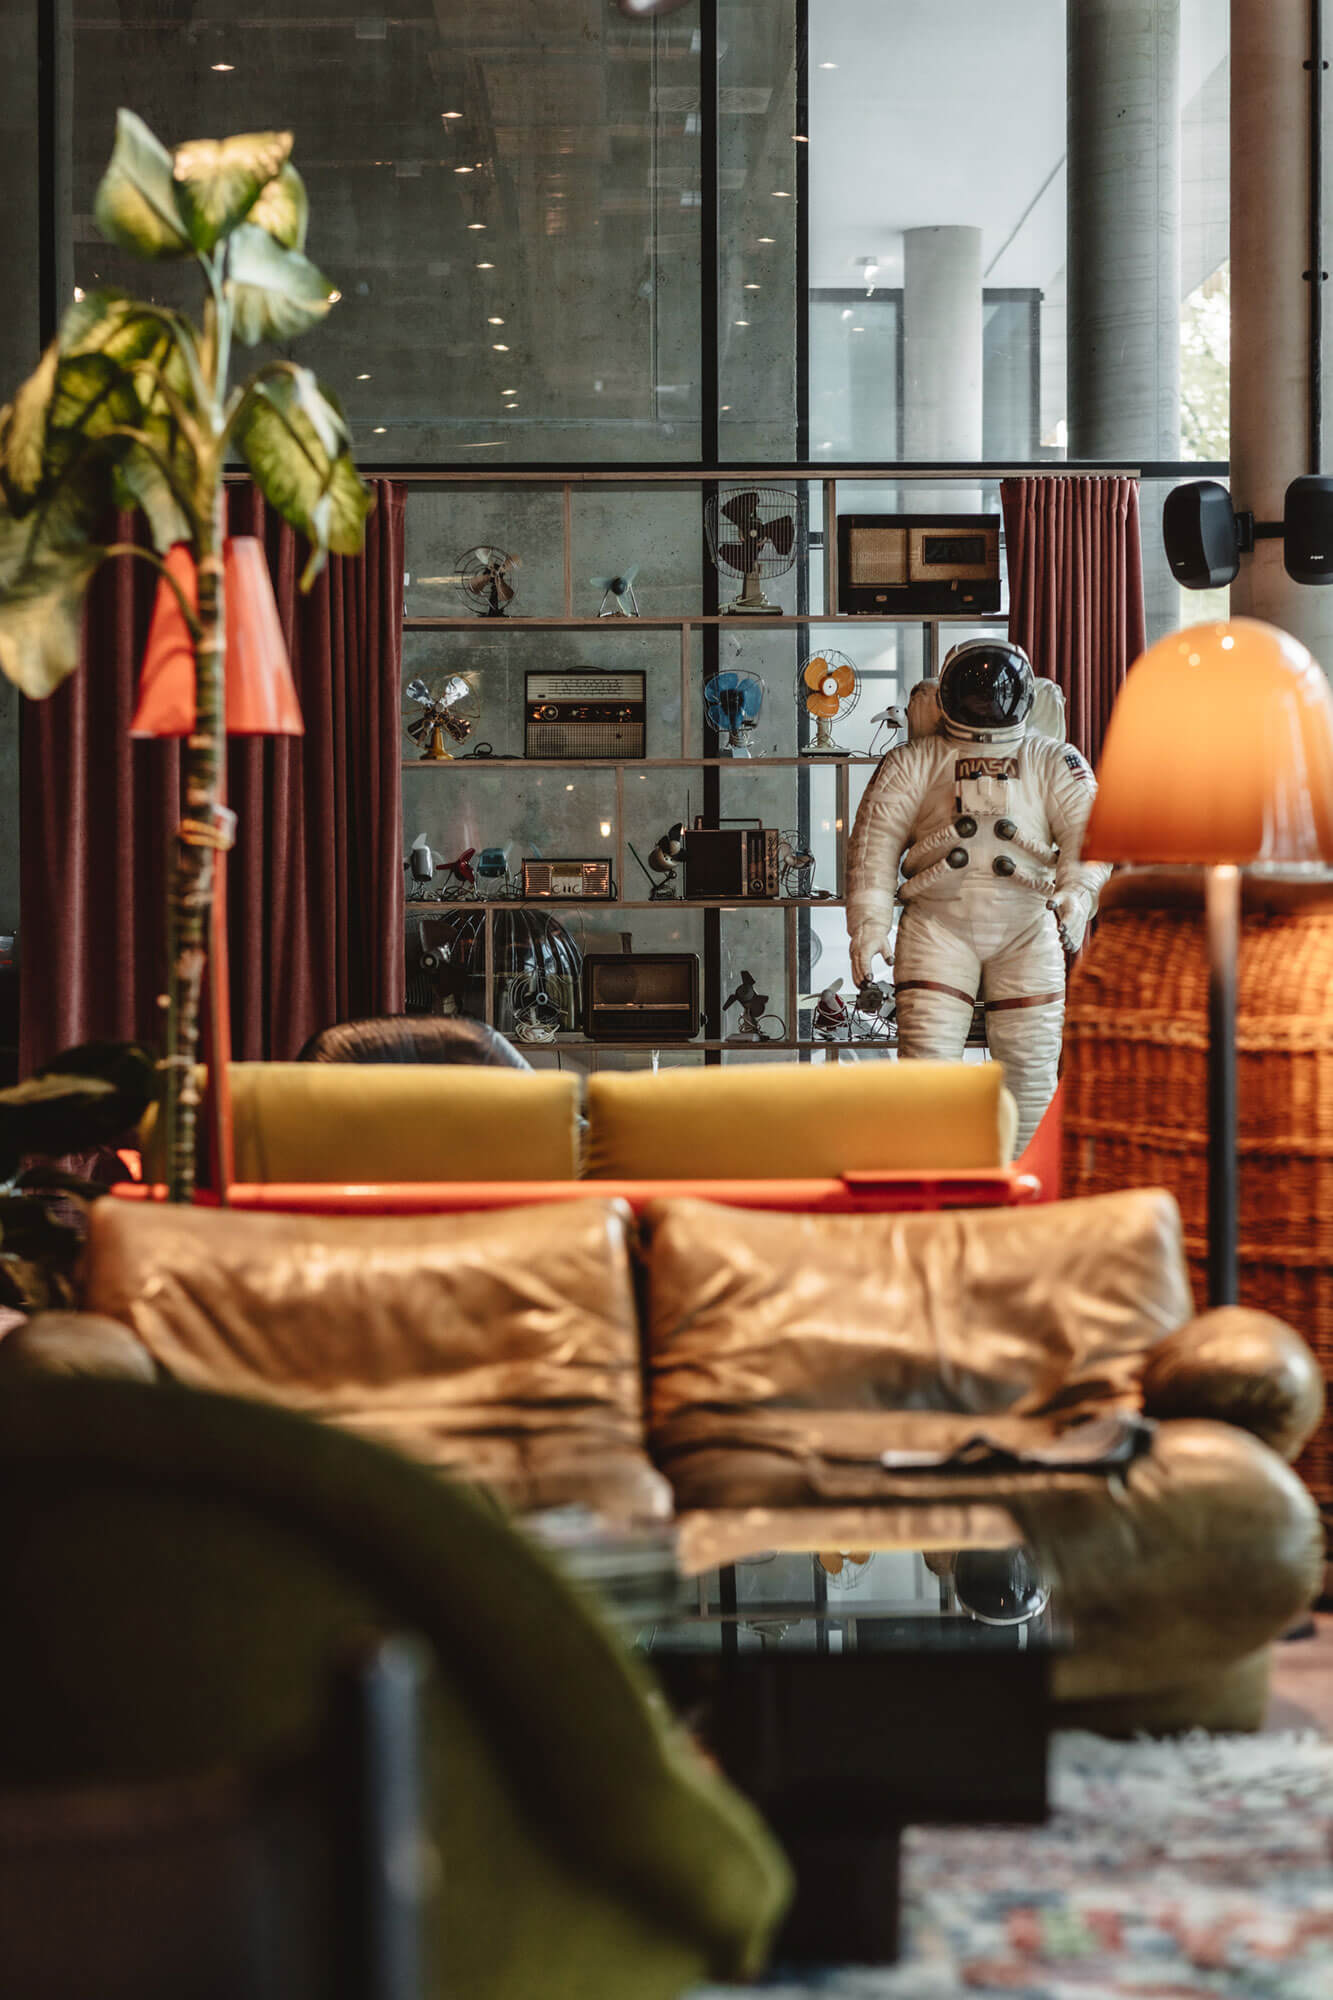 Superbude-Hotel-Hostel-Bachhuber-Hoteleinrichtungen-6